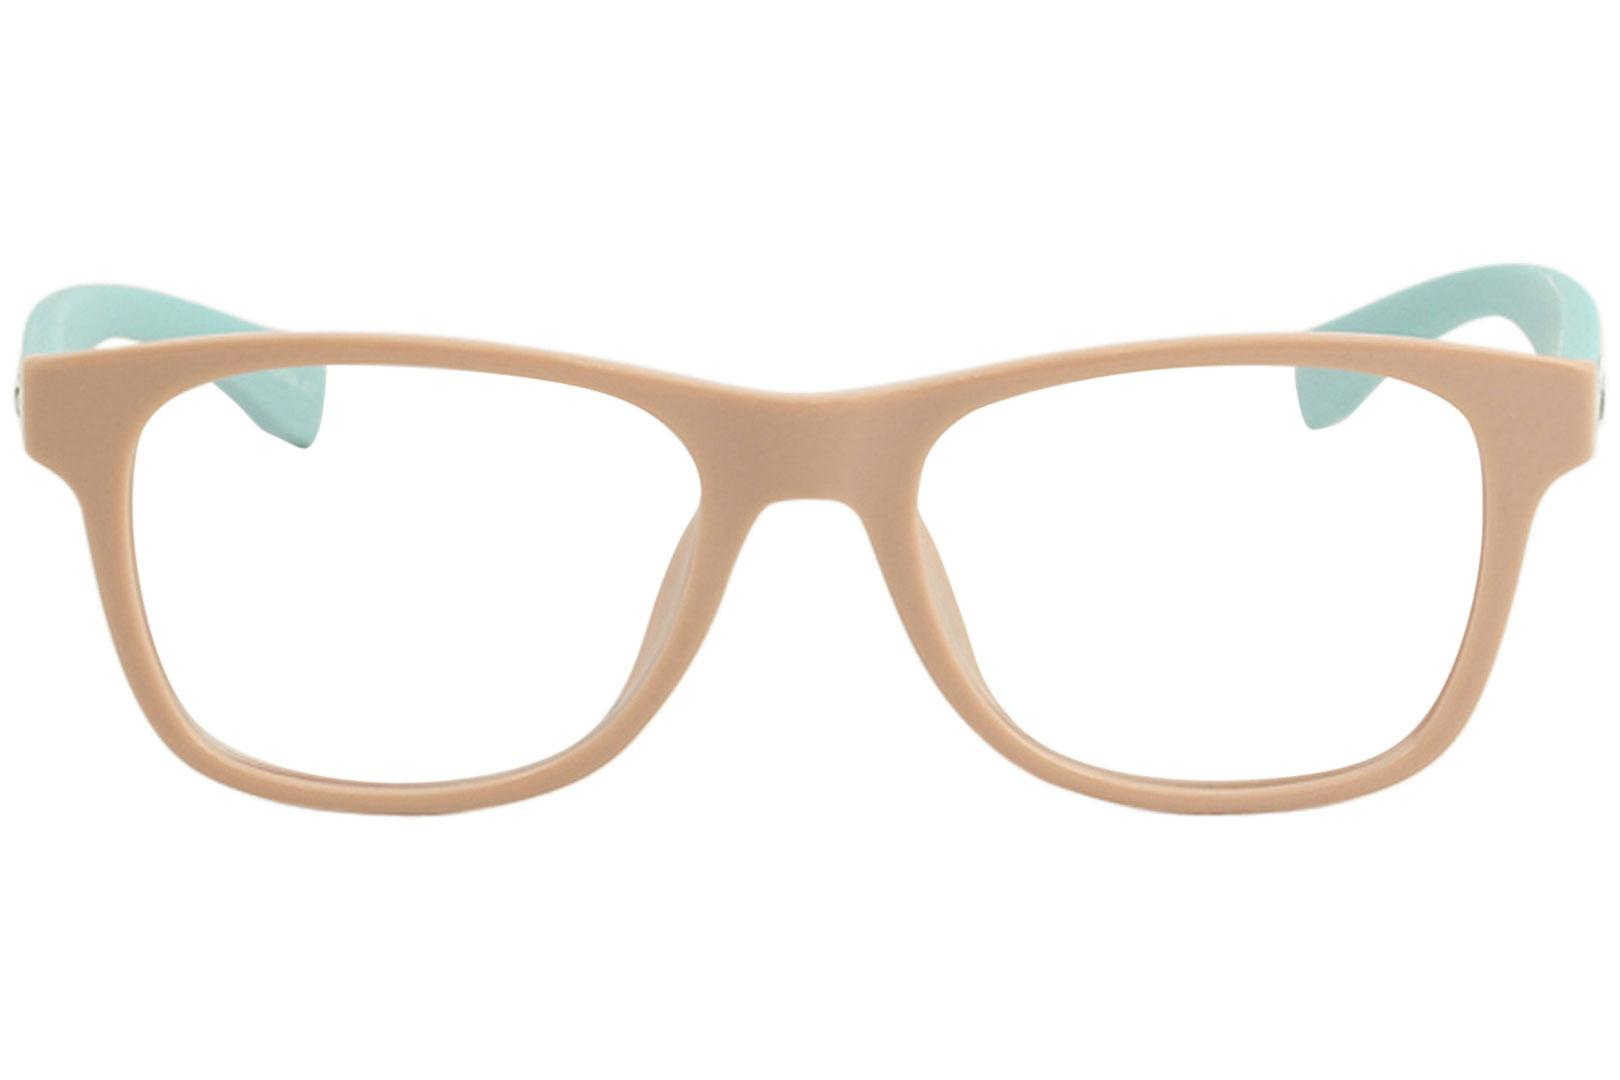 e9fd3aa9e4ac Lacoste Youth Eyeglasses L3620 L 3620 Full Rim Optical Frame by Lacoste